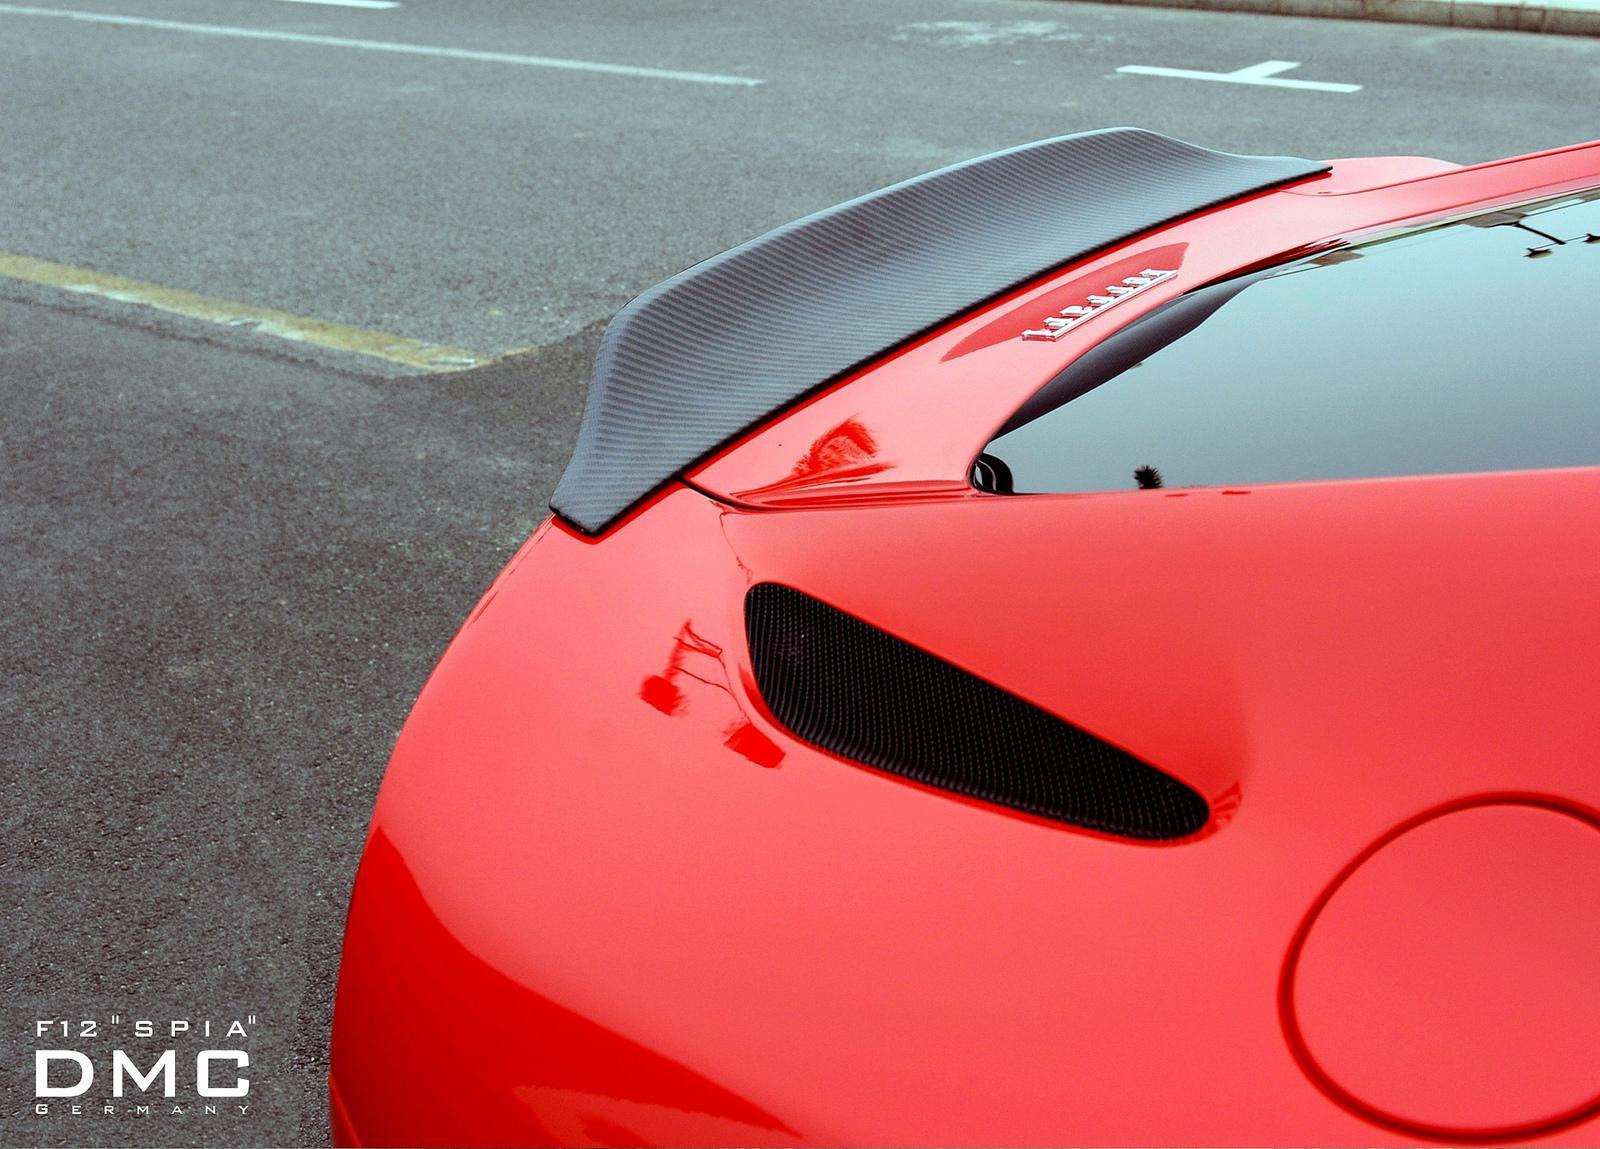 Foto de DMC Ferrari F12 Berlinetta Spia (9/10)